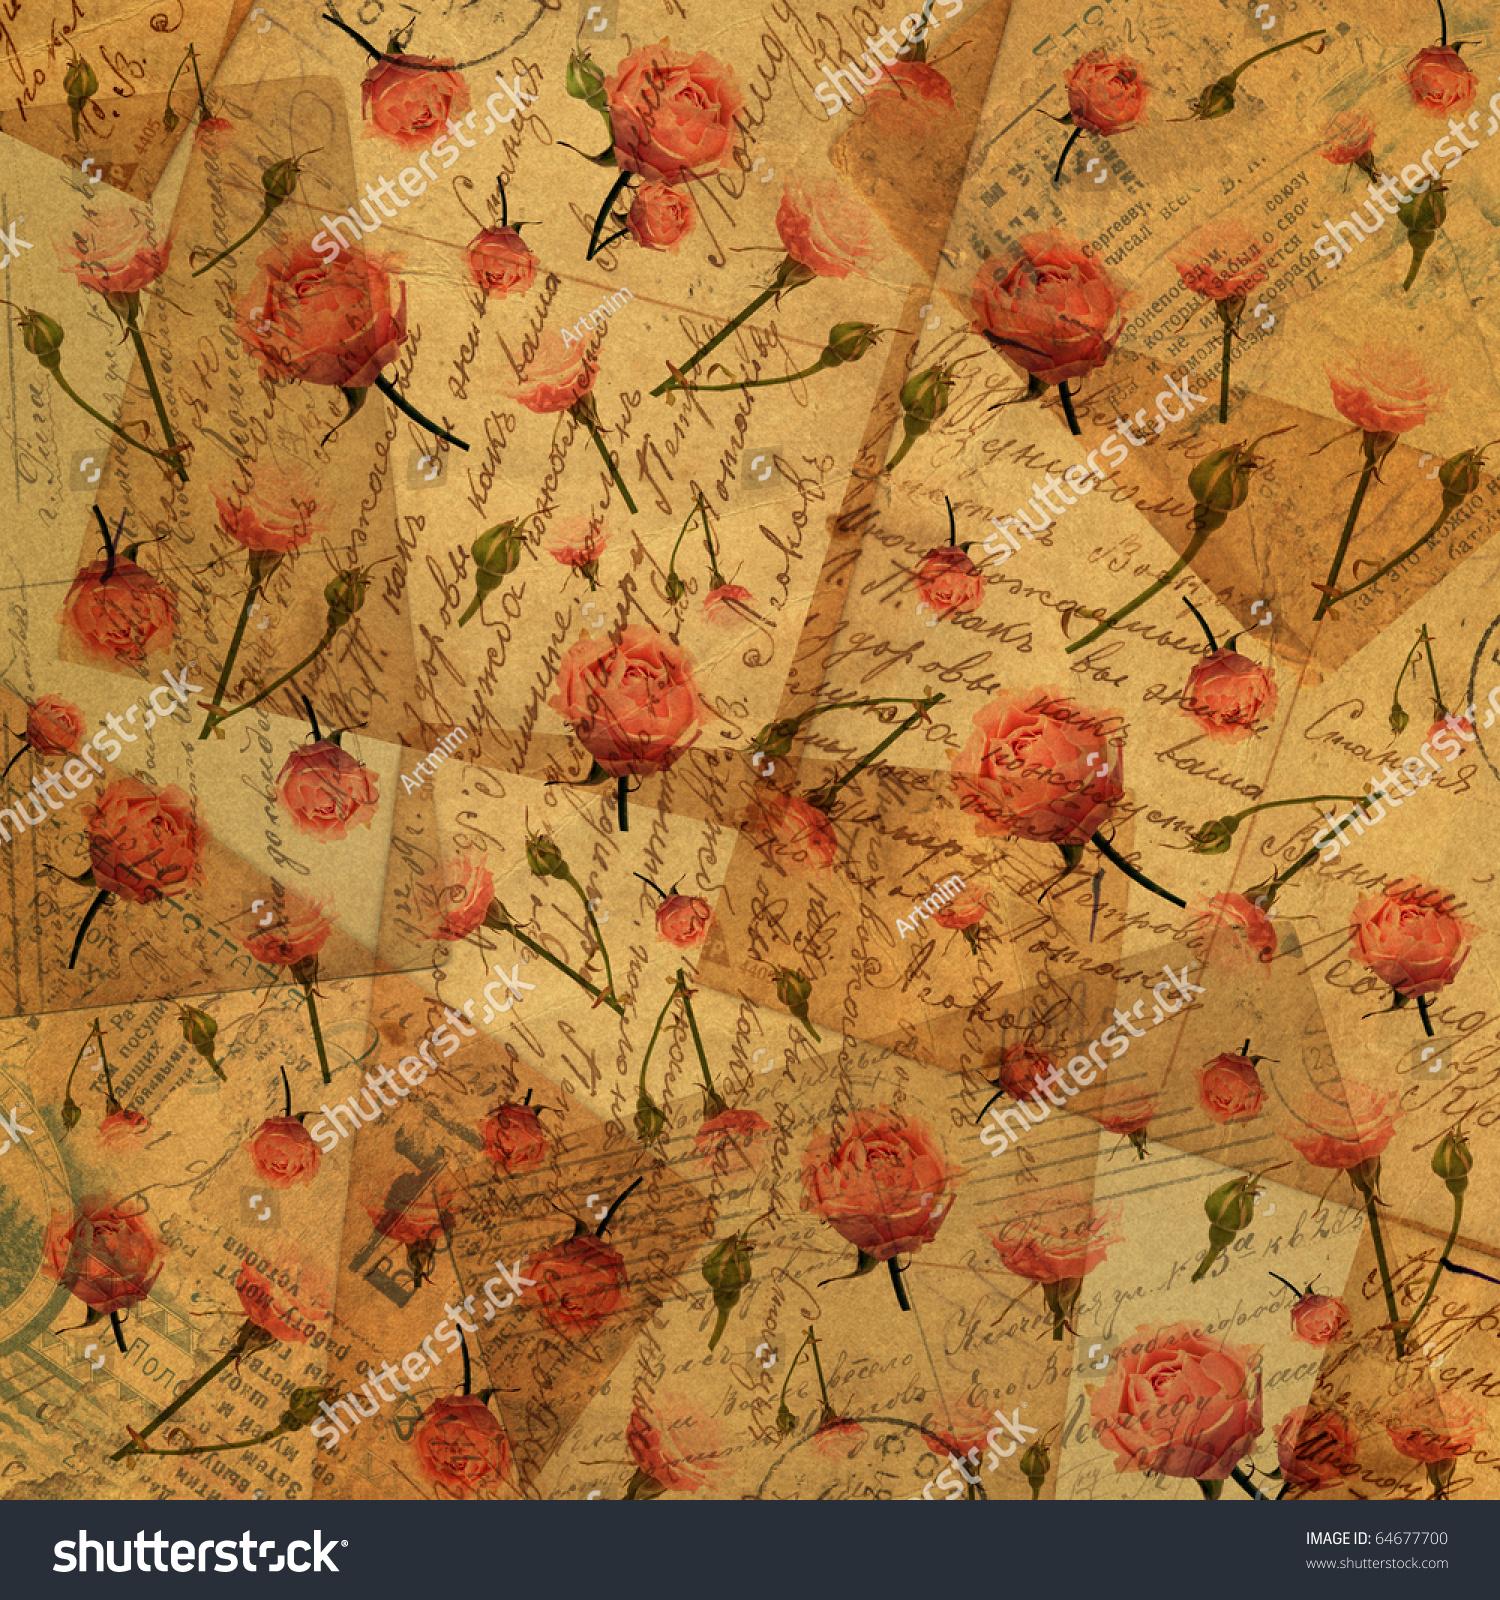 Vintage Paper Flowers Background Scrapbooking Stock Photo Edit Now